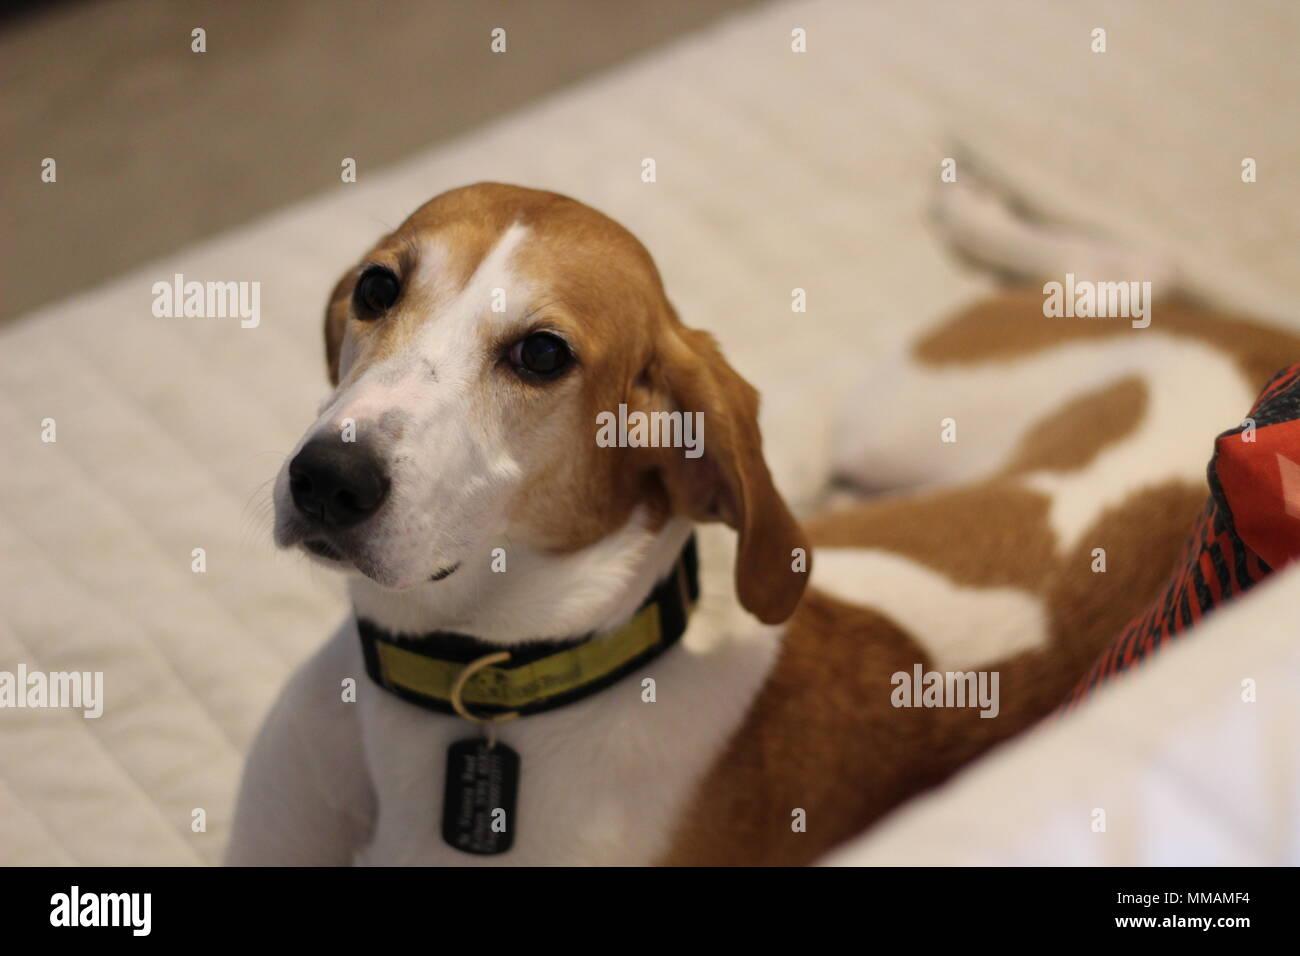 Cute rescue dog - Stock Image